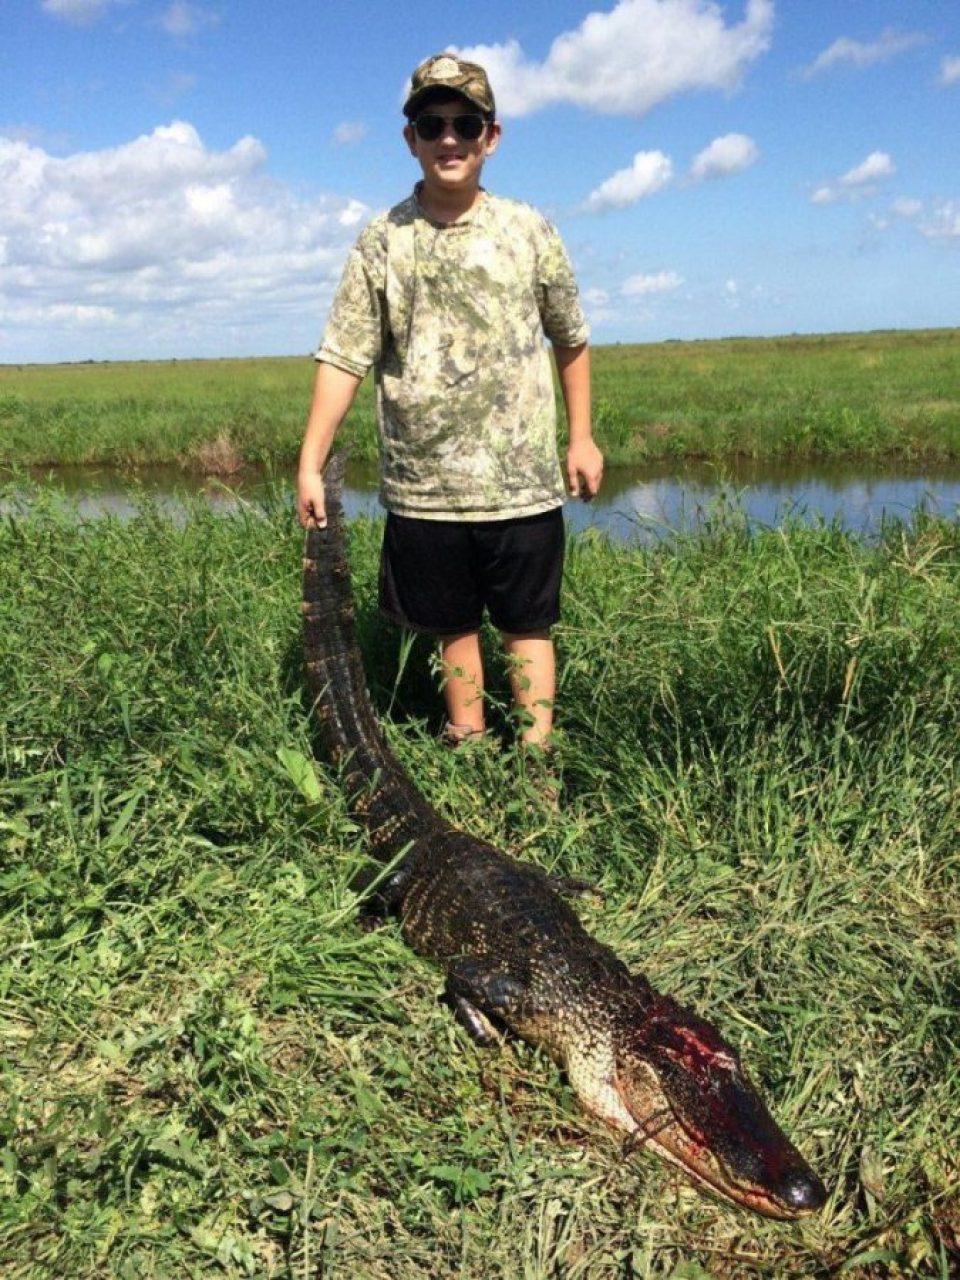 Noah-Dimick-7-Foot-Alligator